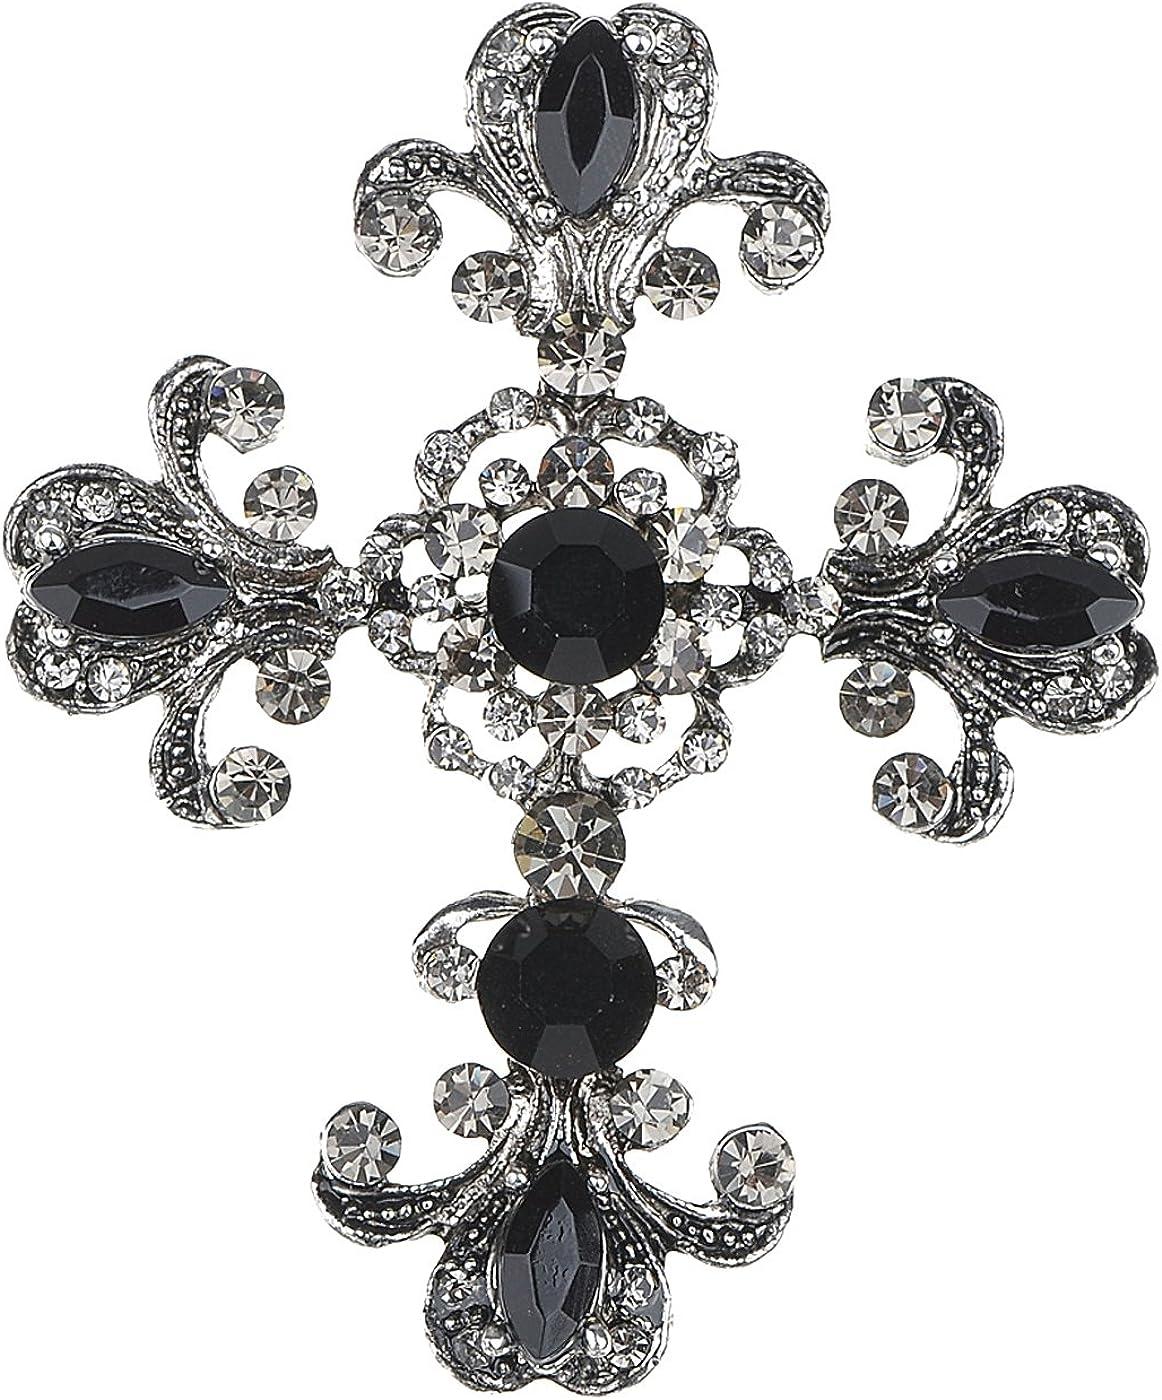 Rhinestone Claddagh Clover Cross Bracelet and Brooch